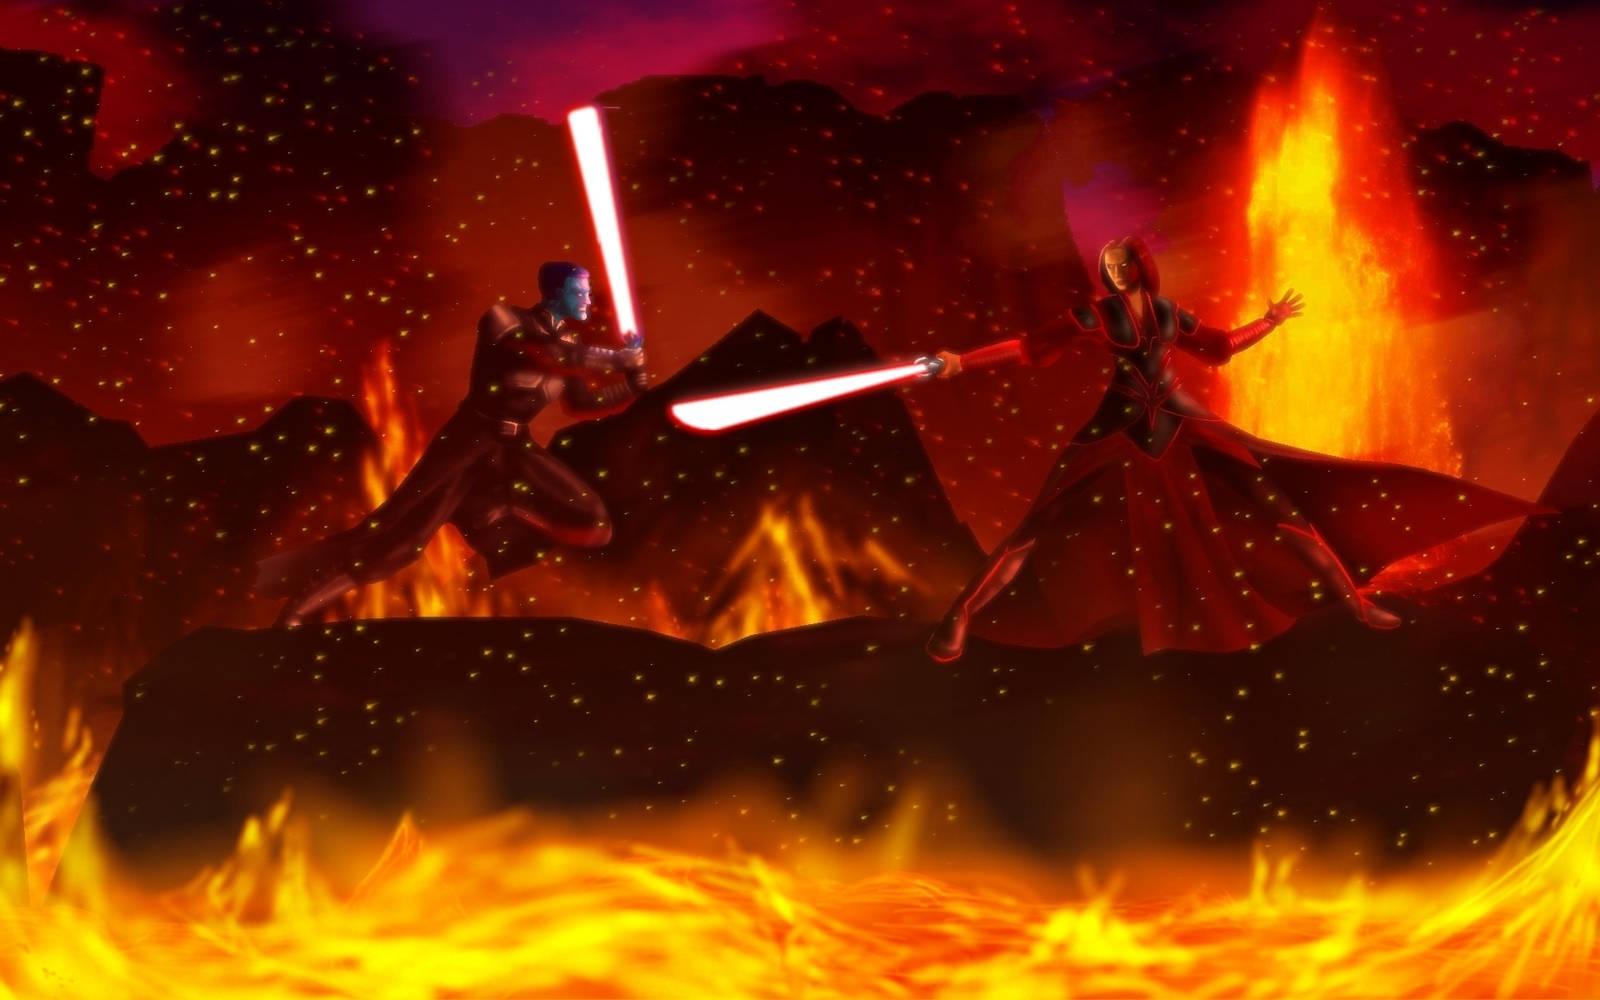 Firedance by Vince-T